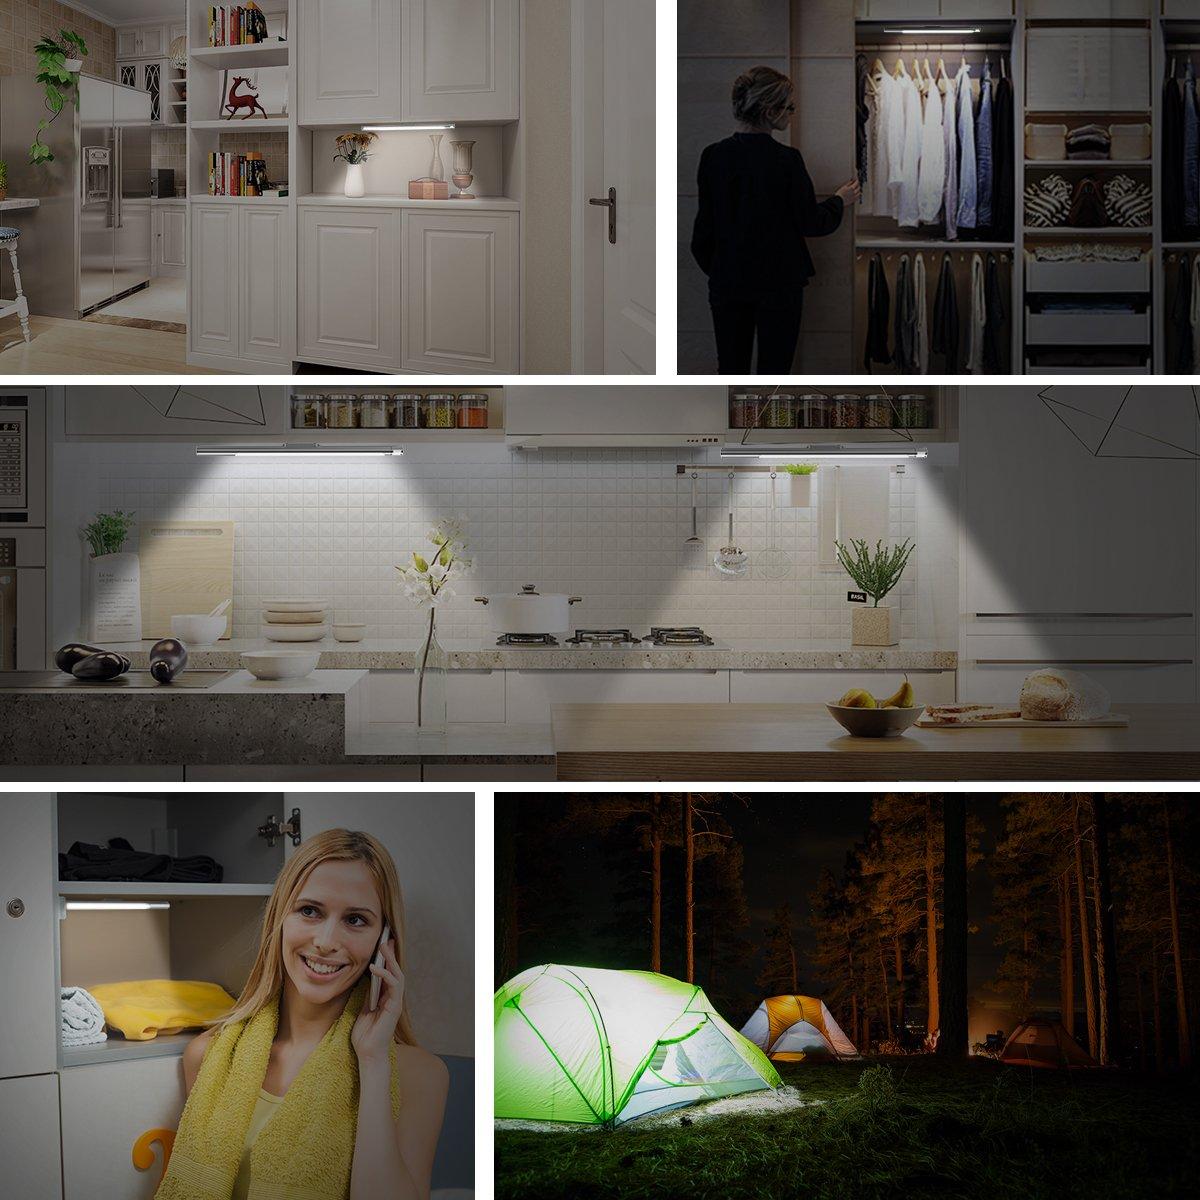 Motion Sensor Closet Light, Upgraded Rechargeable 39 LED Wardrobe Light Stick-on Anywhere Under Cabinet Lighting/Hallway / Closet/Night Light Bar, 2 Sensor Mode (Only Motion, Motion & Light) by LOFTER (Image #2)